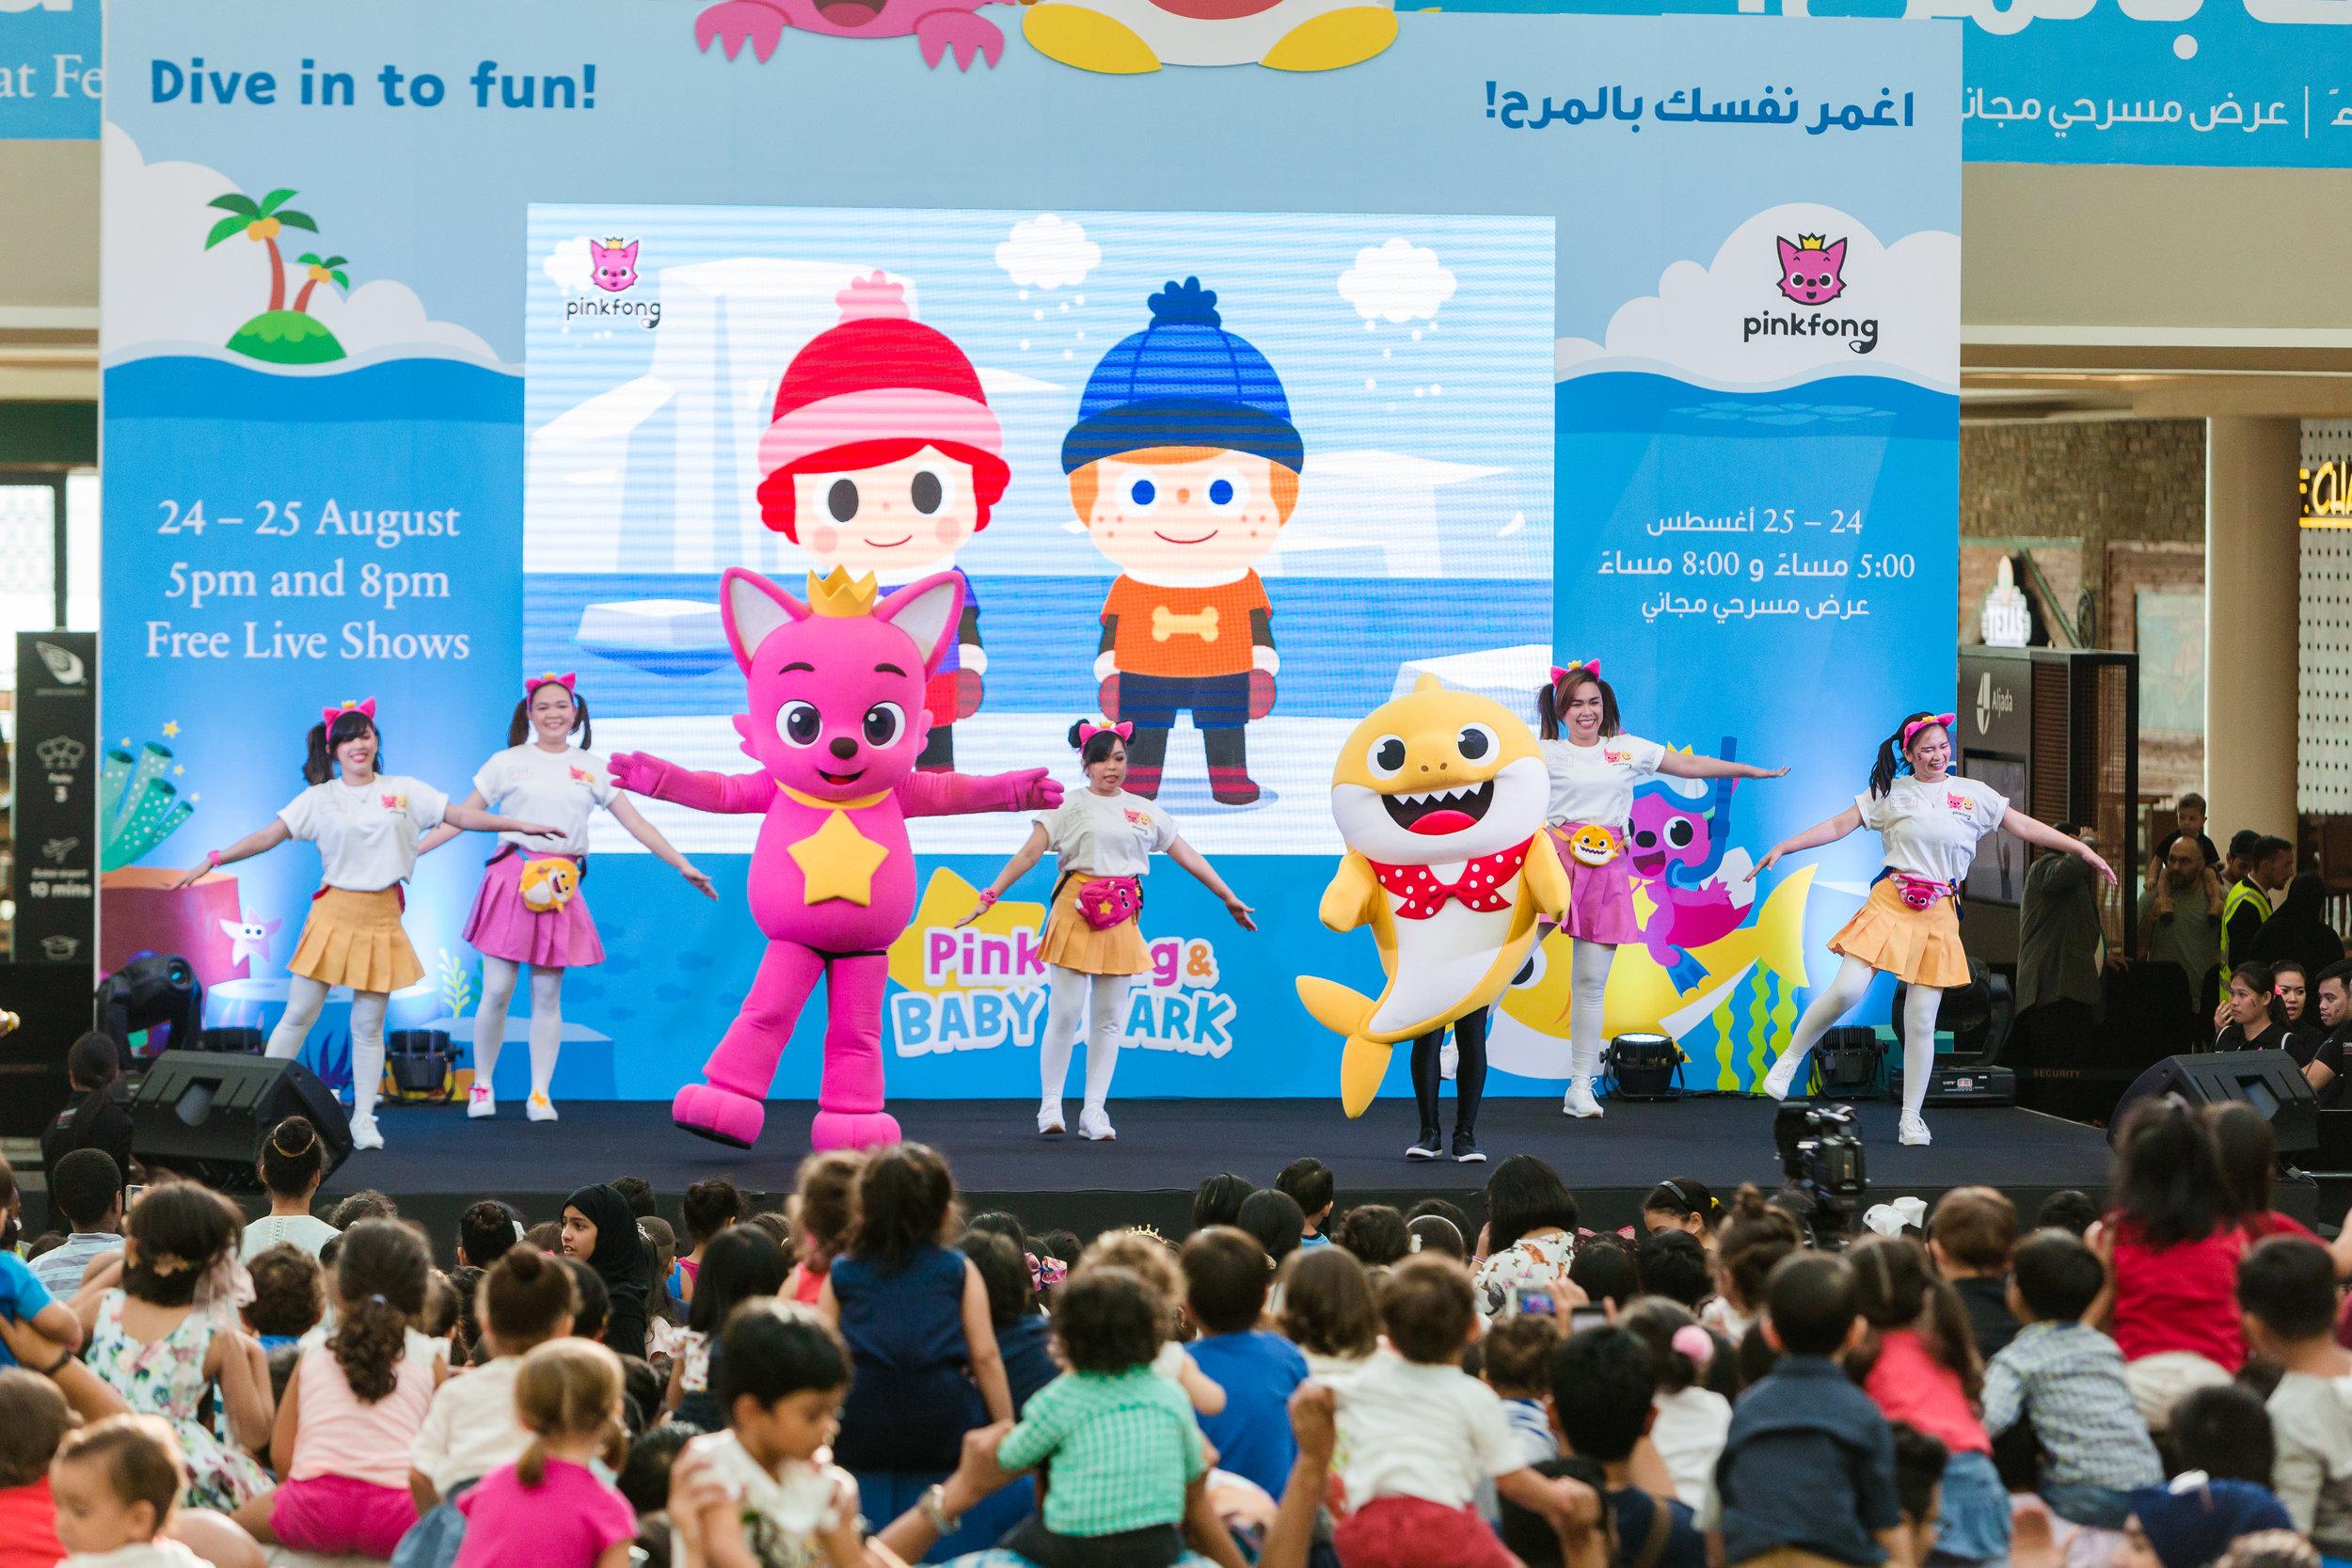 Pink Fonk Baby Shark Dubai Corporate Photographer